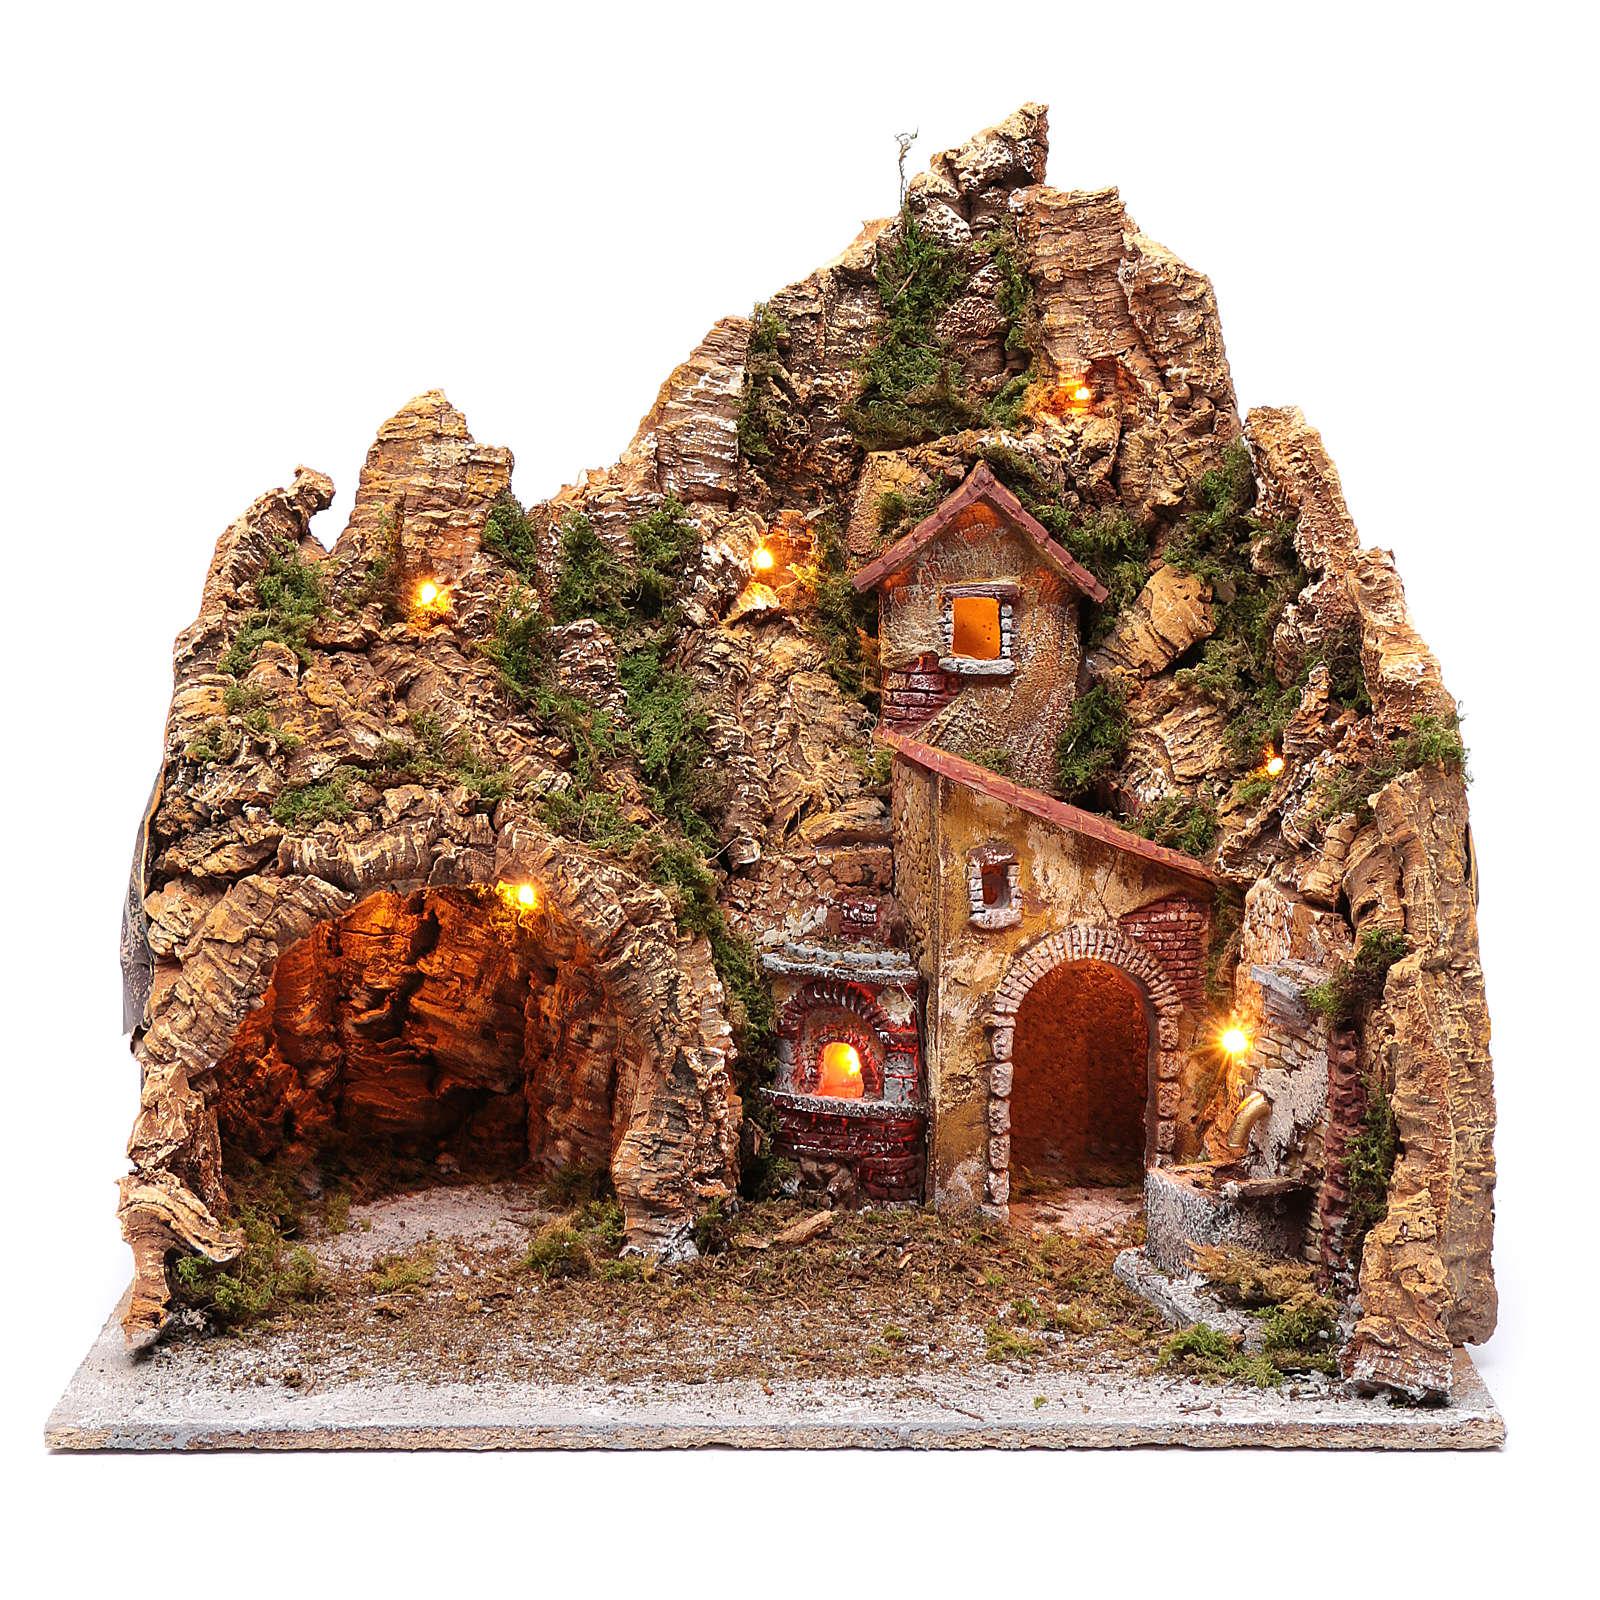 Neapolitan nativity scene setting with hut, fountain and oven 45X45X35 cm 4